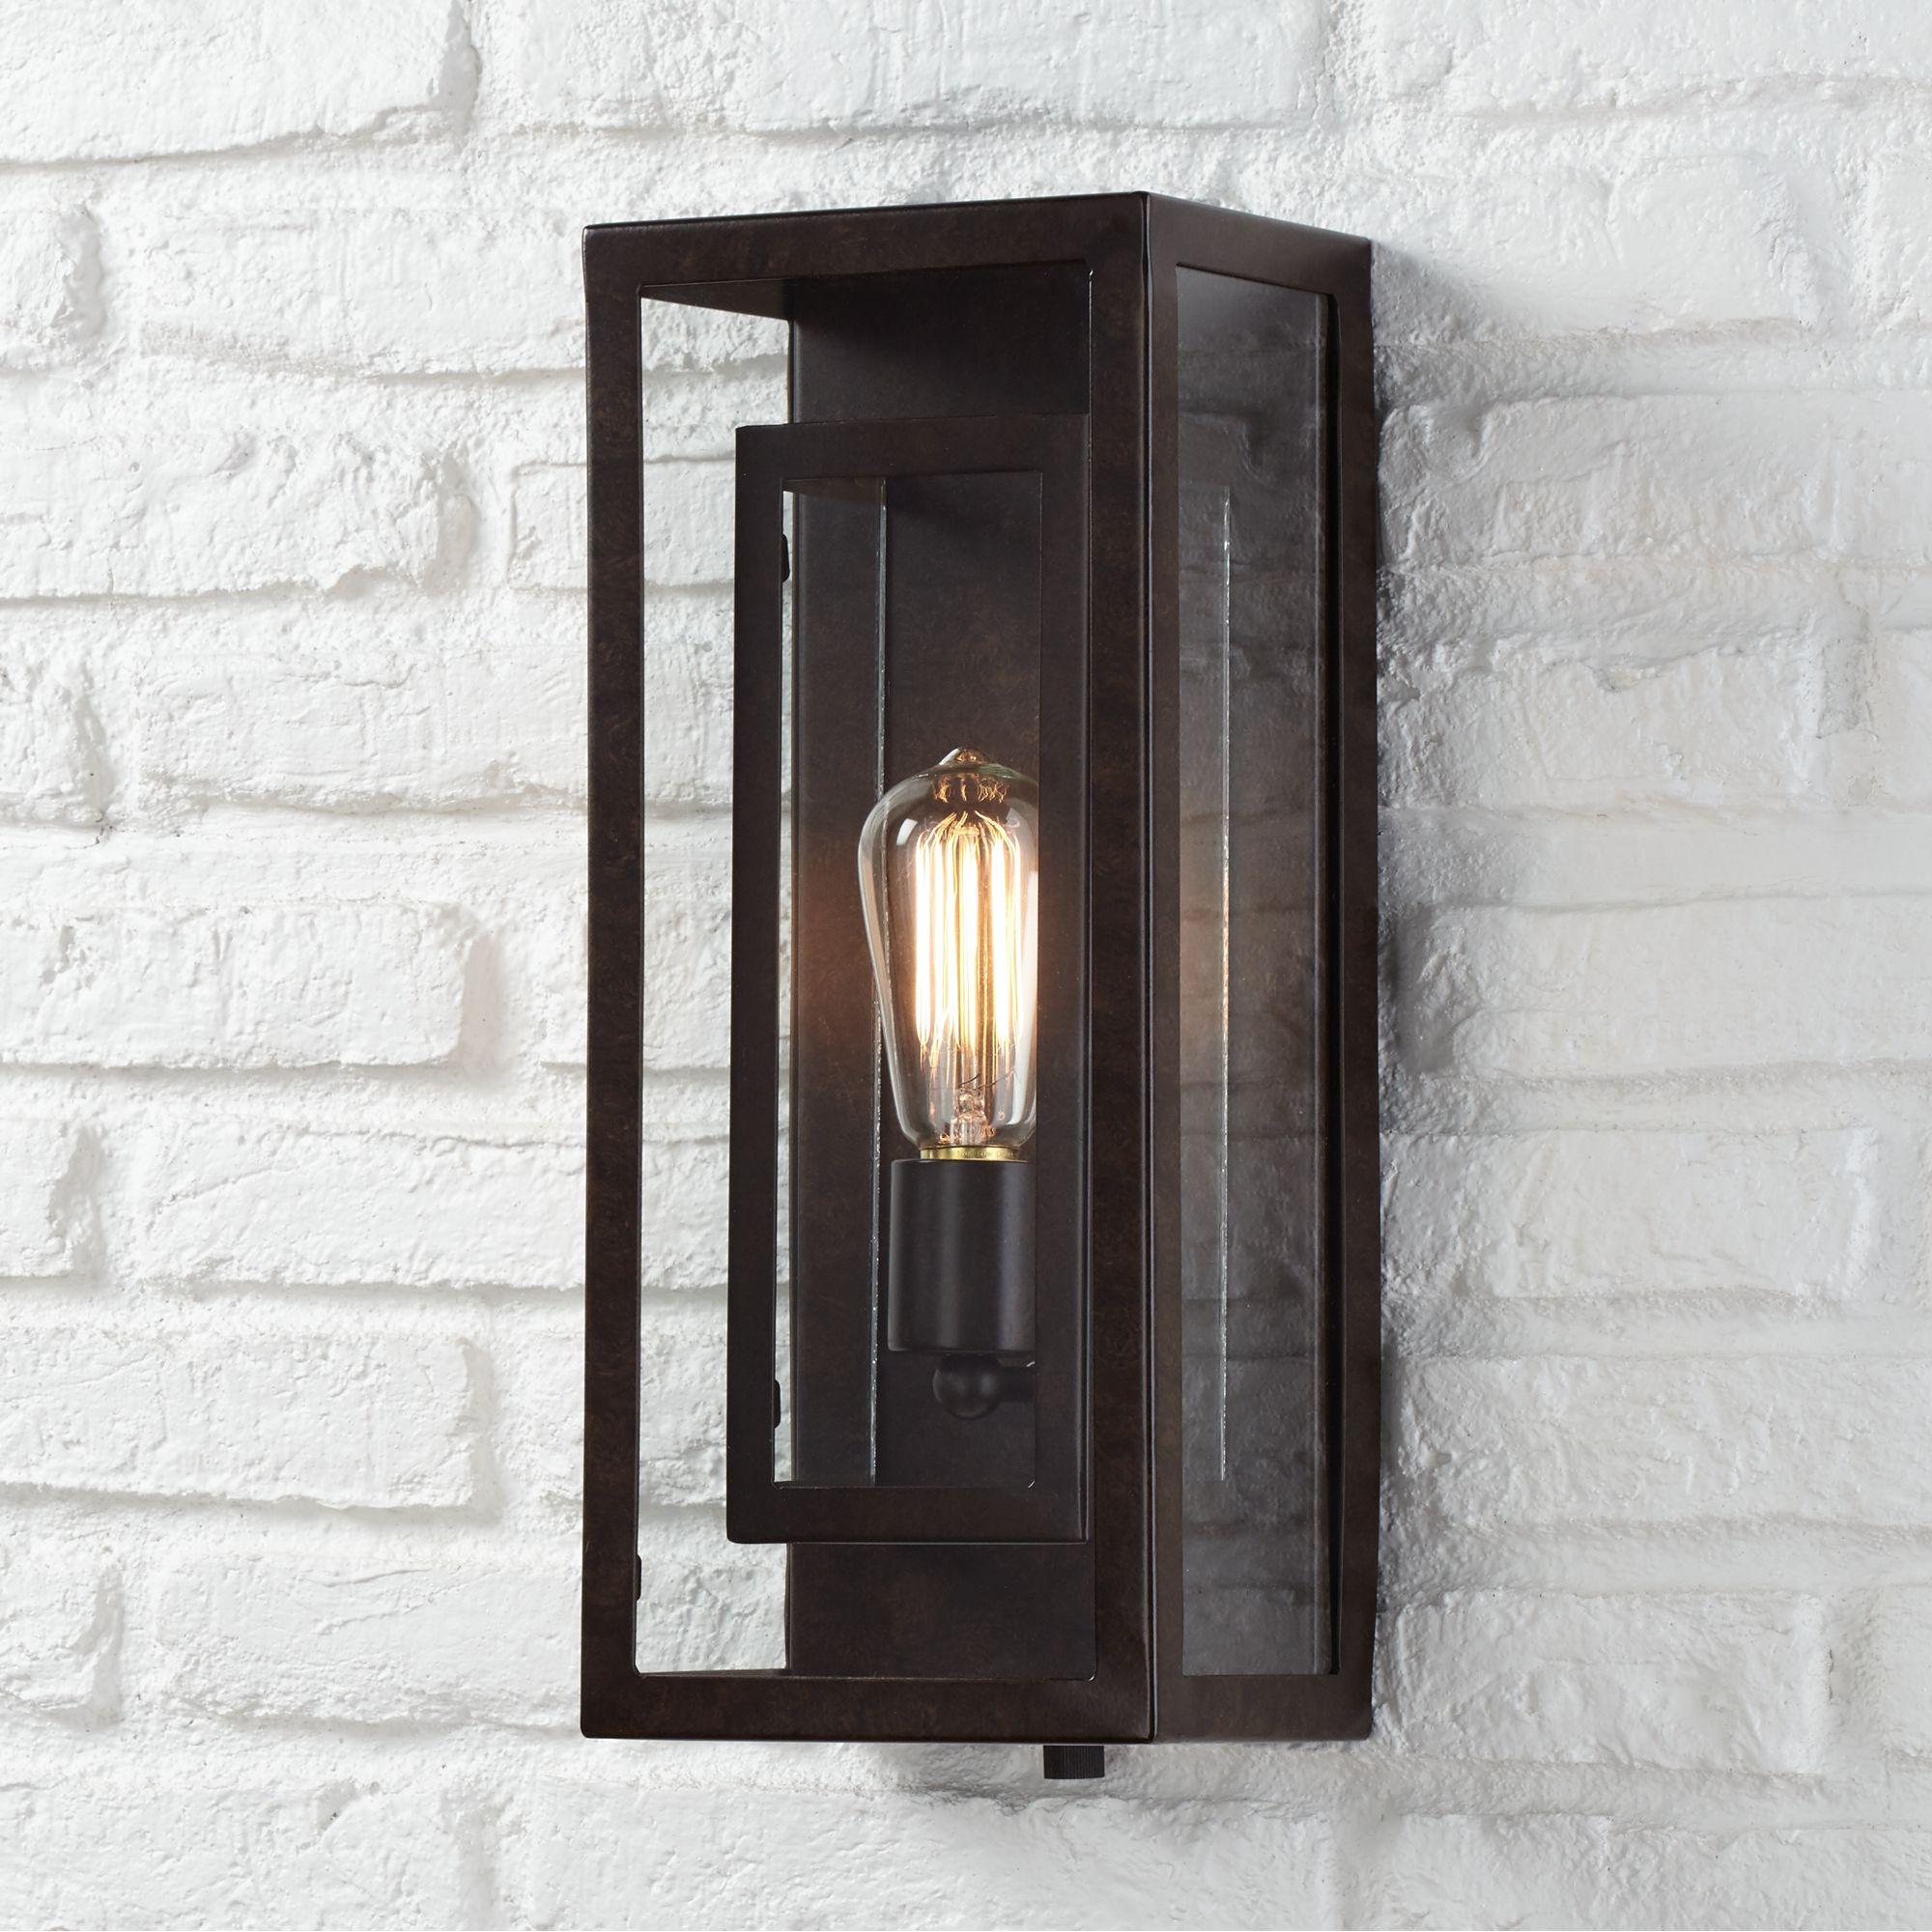 "Possini Euro Design Modern Outdoor Wall Light Fixture Bronze Double Box 15 1/2"" Clear Glass Exterior House Deck"